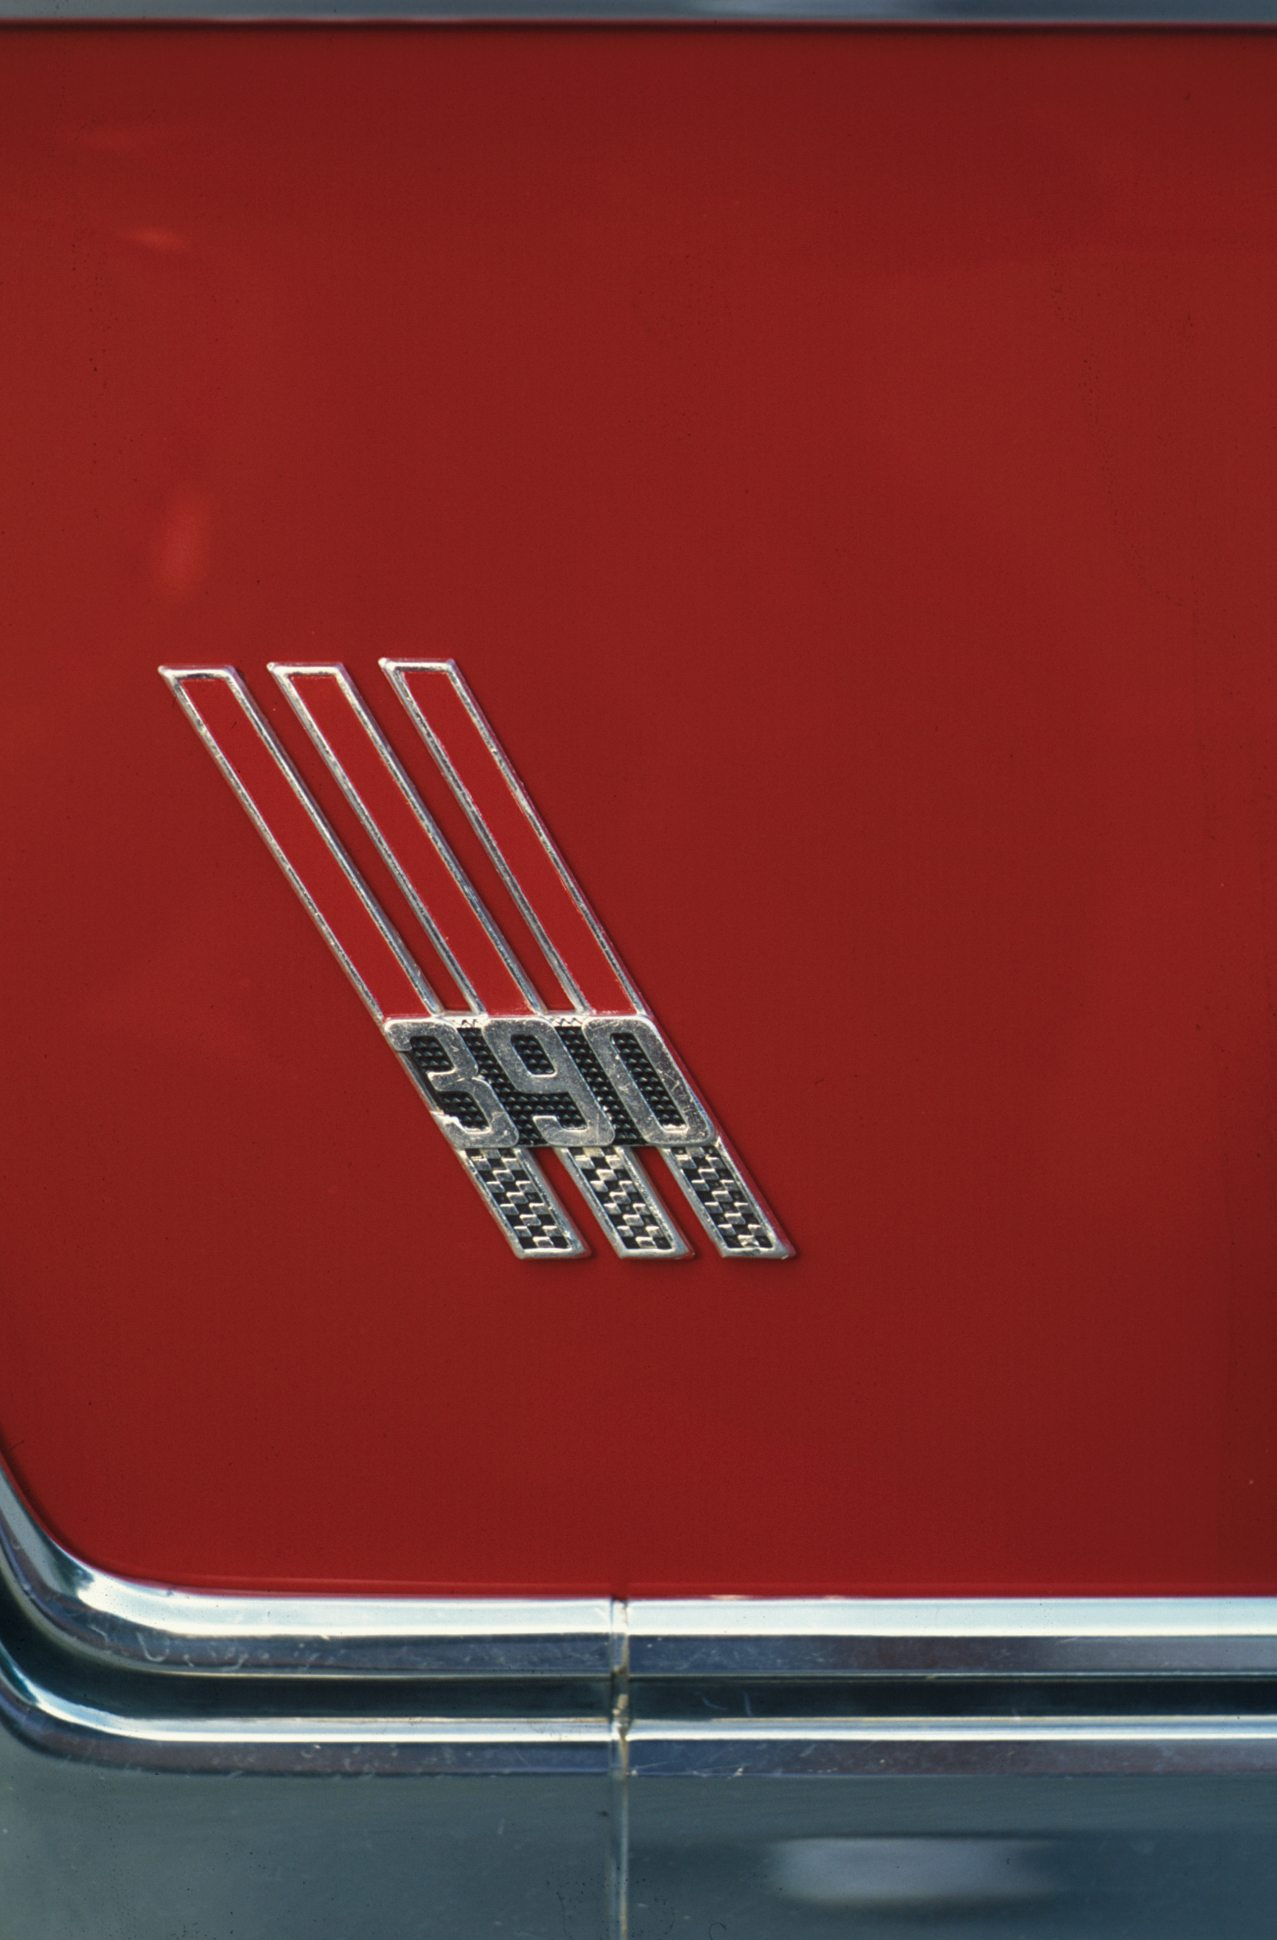 1967 Ford Galaxie 500 | Heacock Classic Insurance